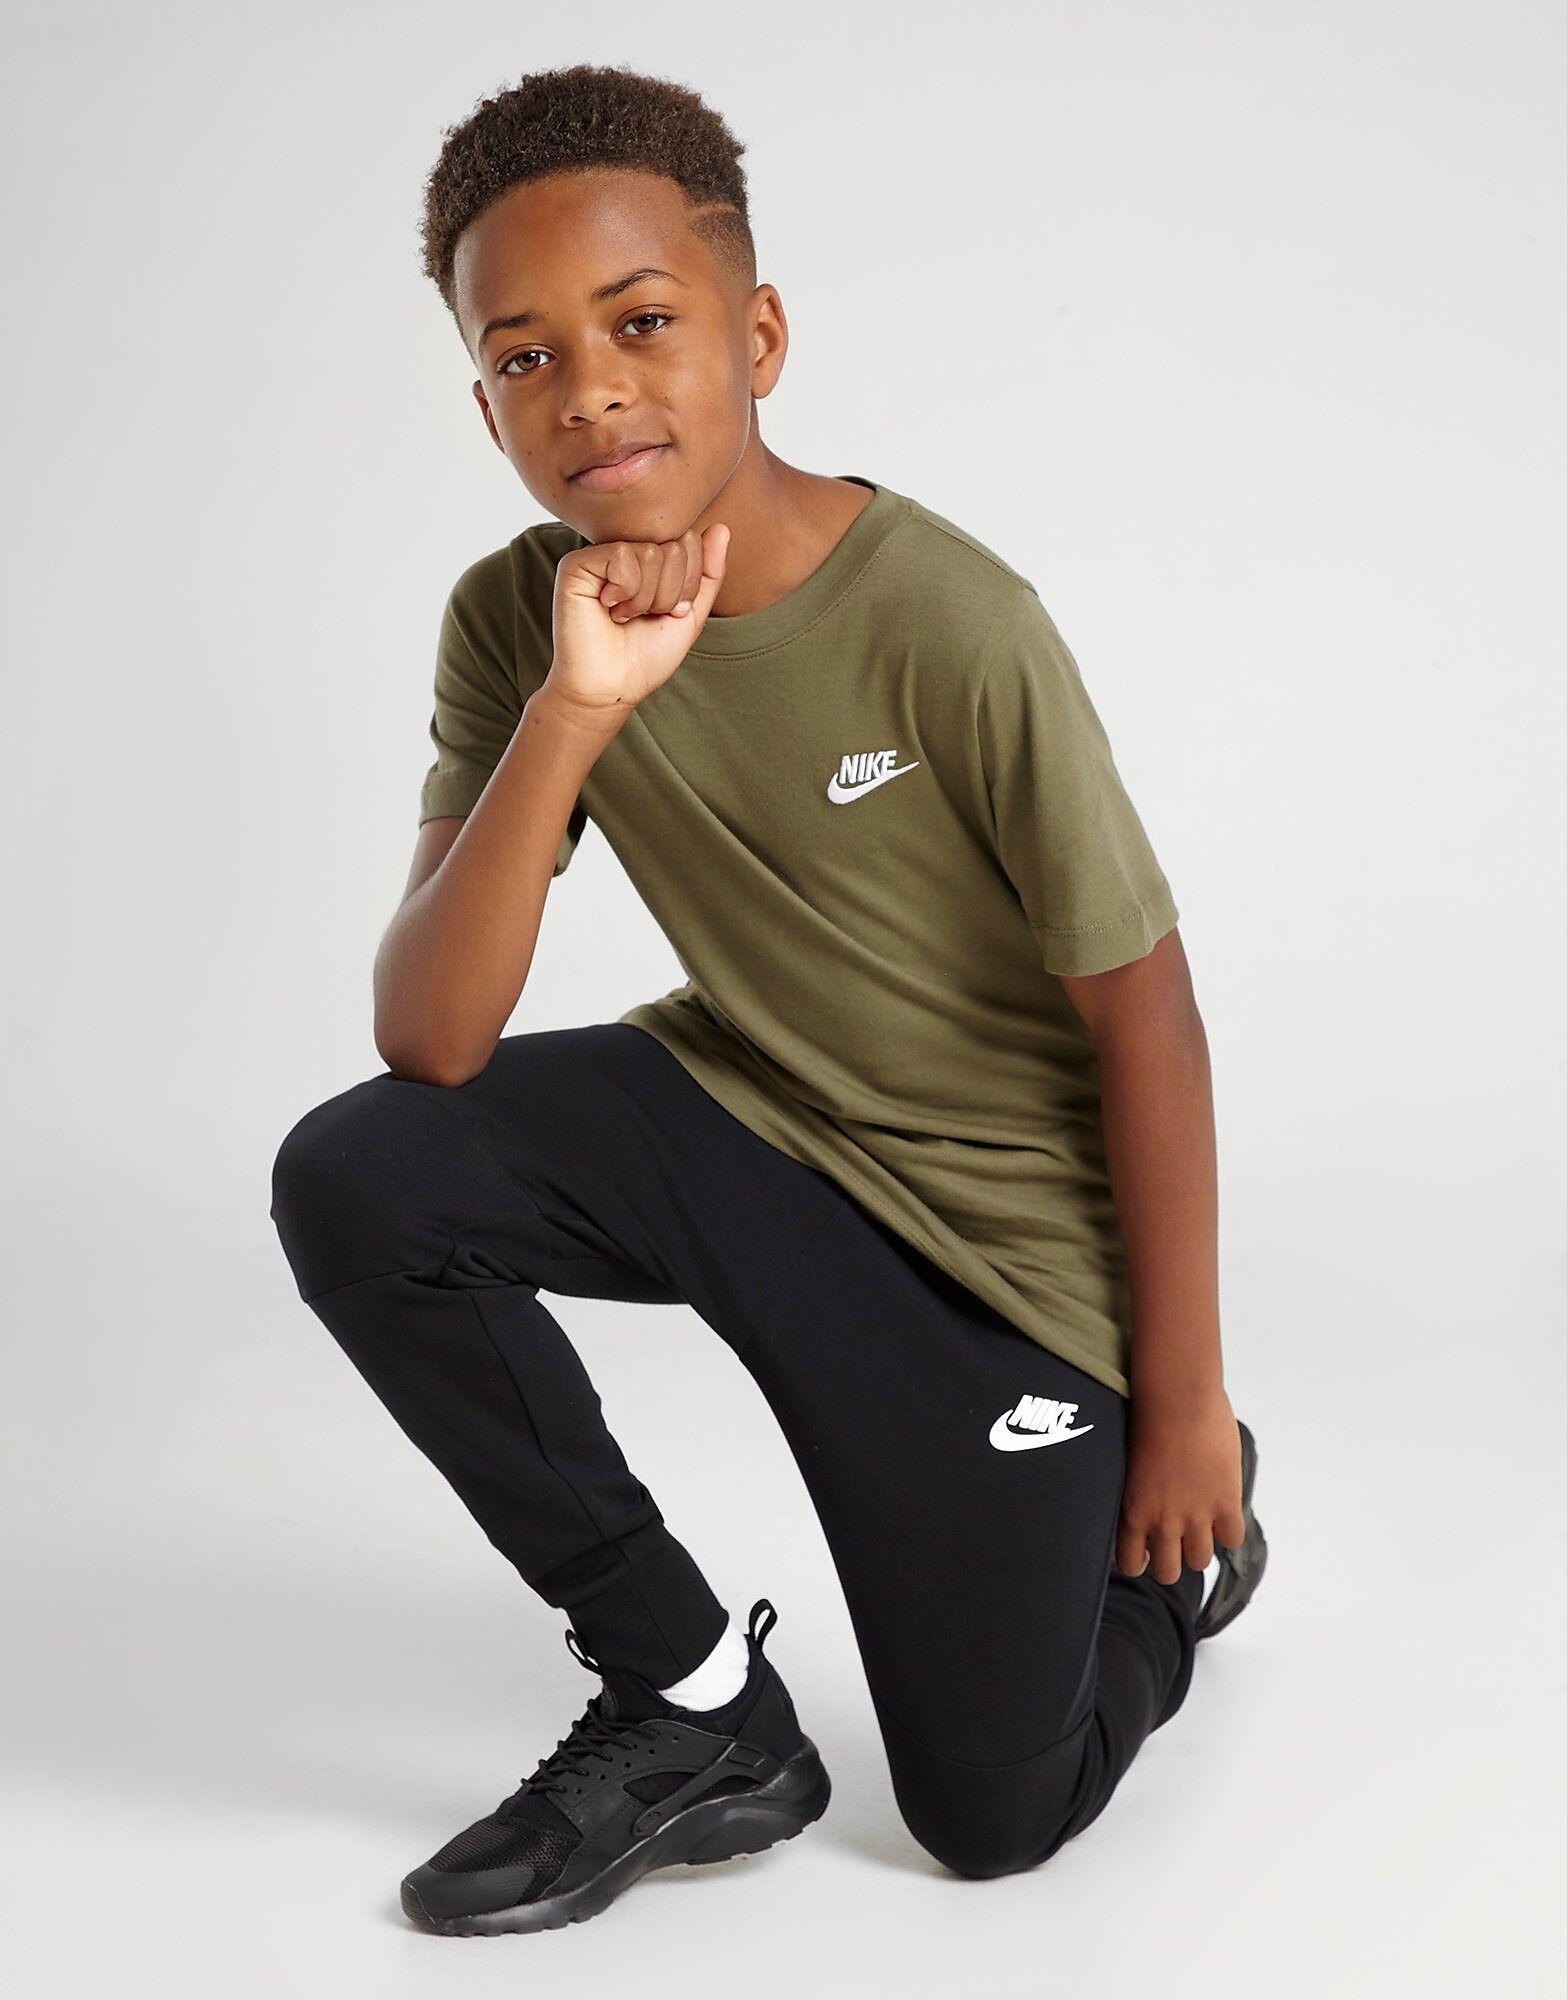 Image of Nike Verryttelyhousut Juniorit - Kids, Musta